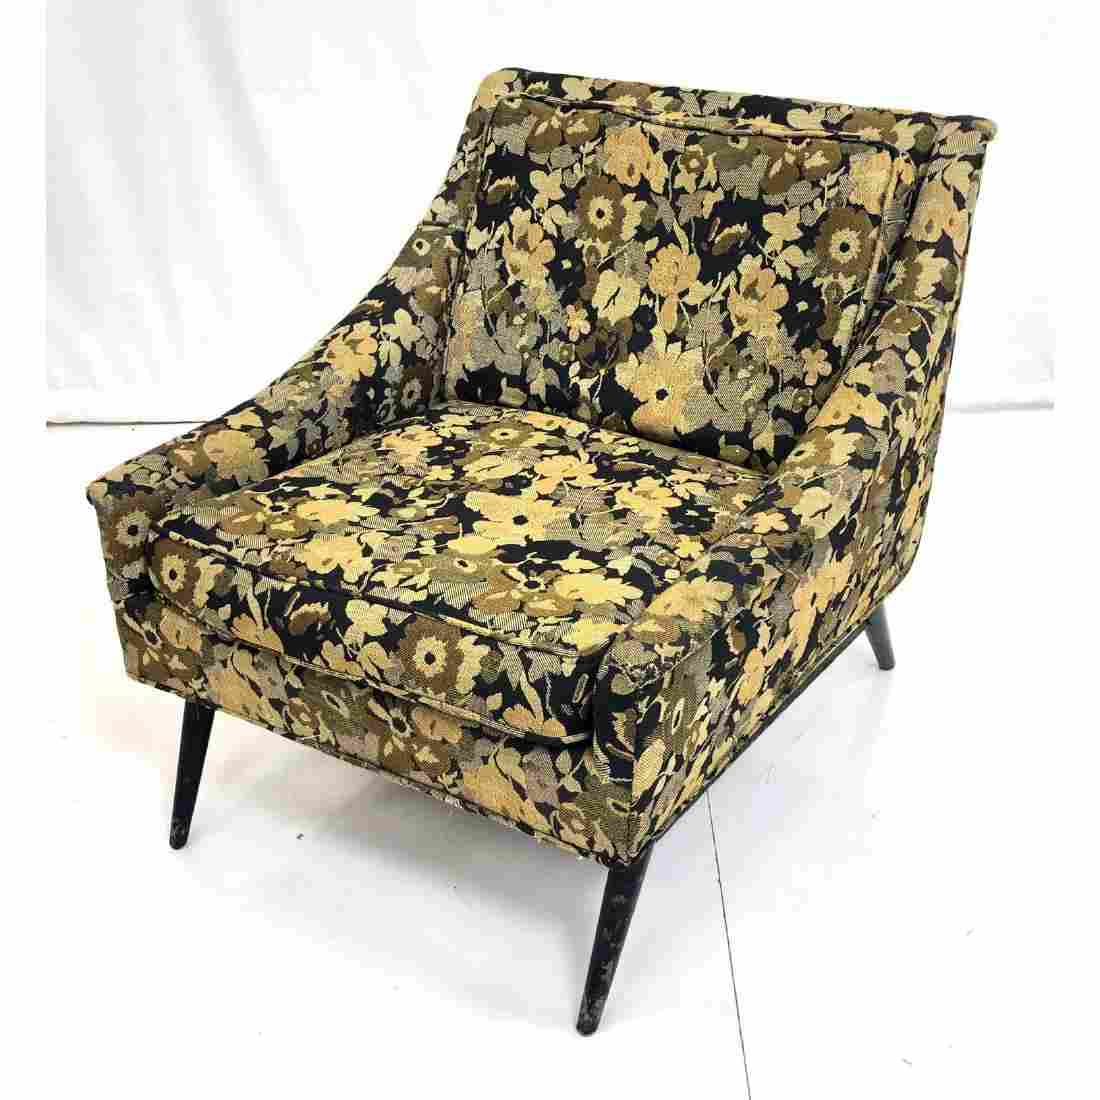 Floral Upholstered Modernist Lounge Chair. Sloped